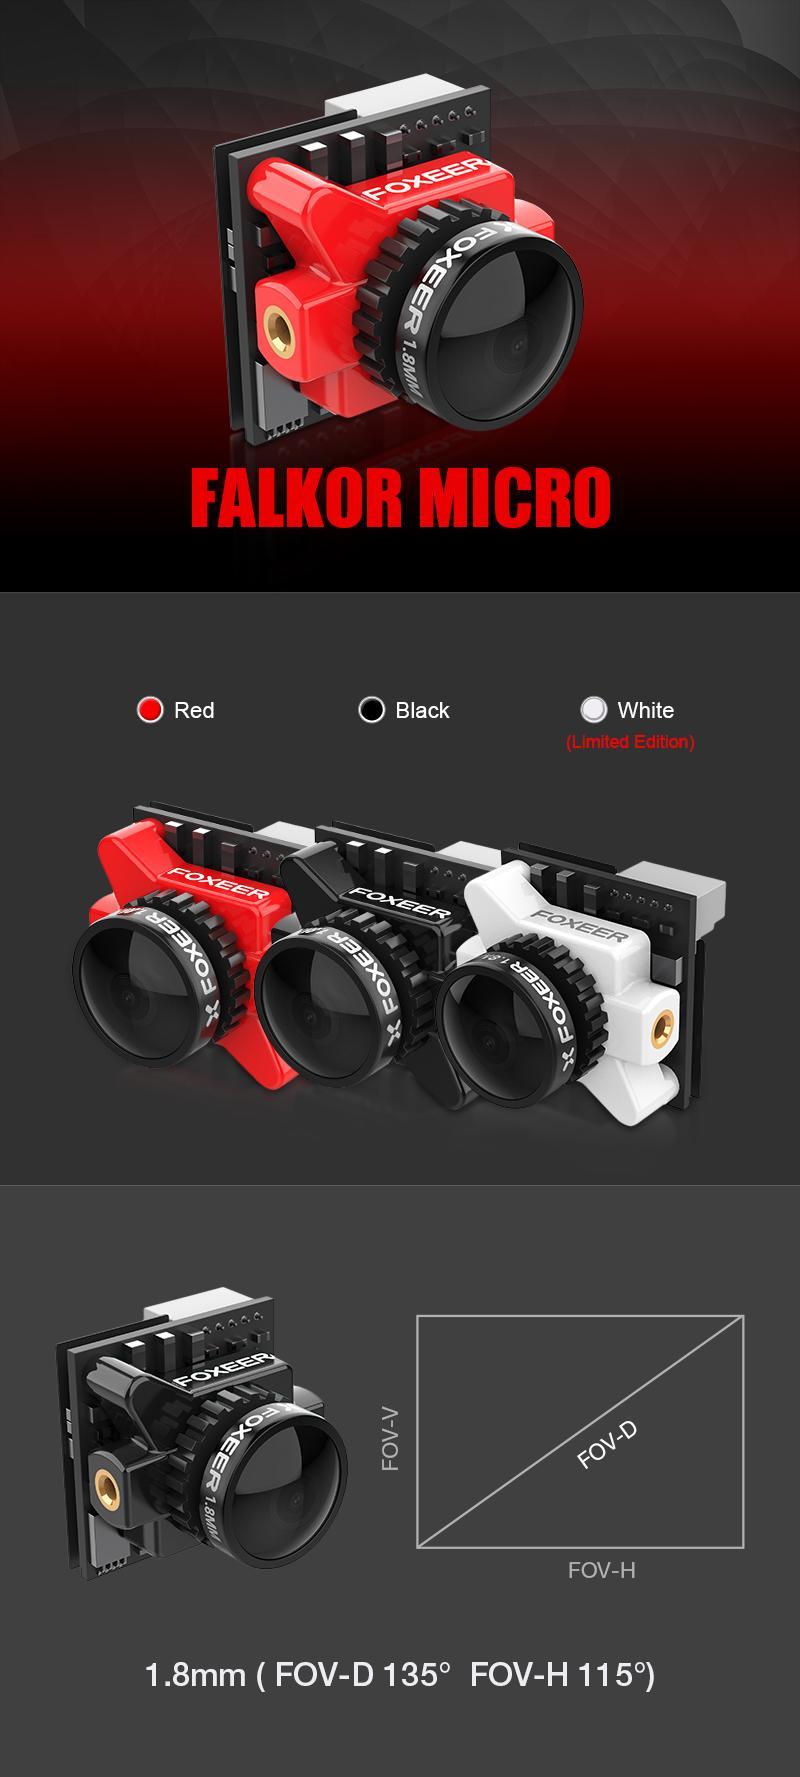 Foxeer Falkor Micro Camera